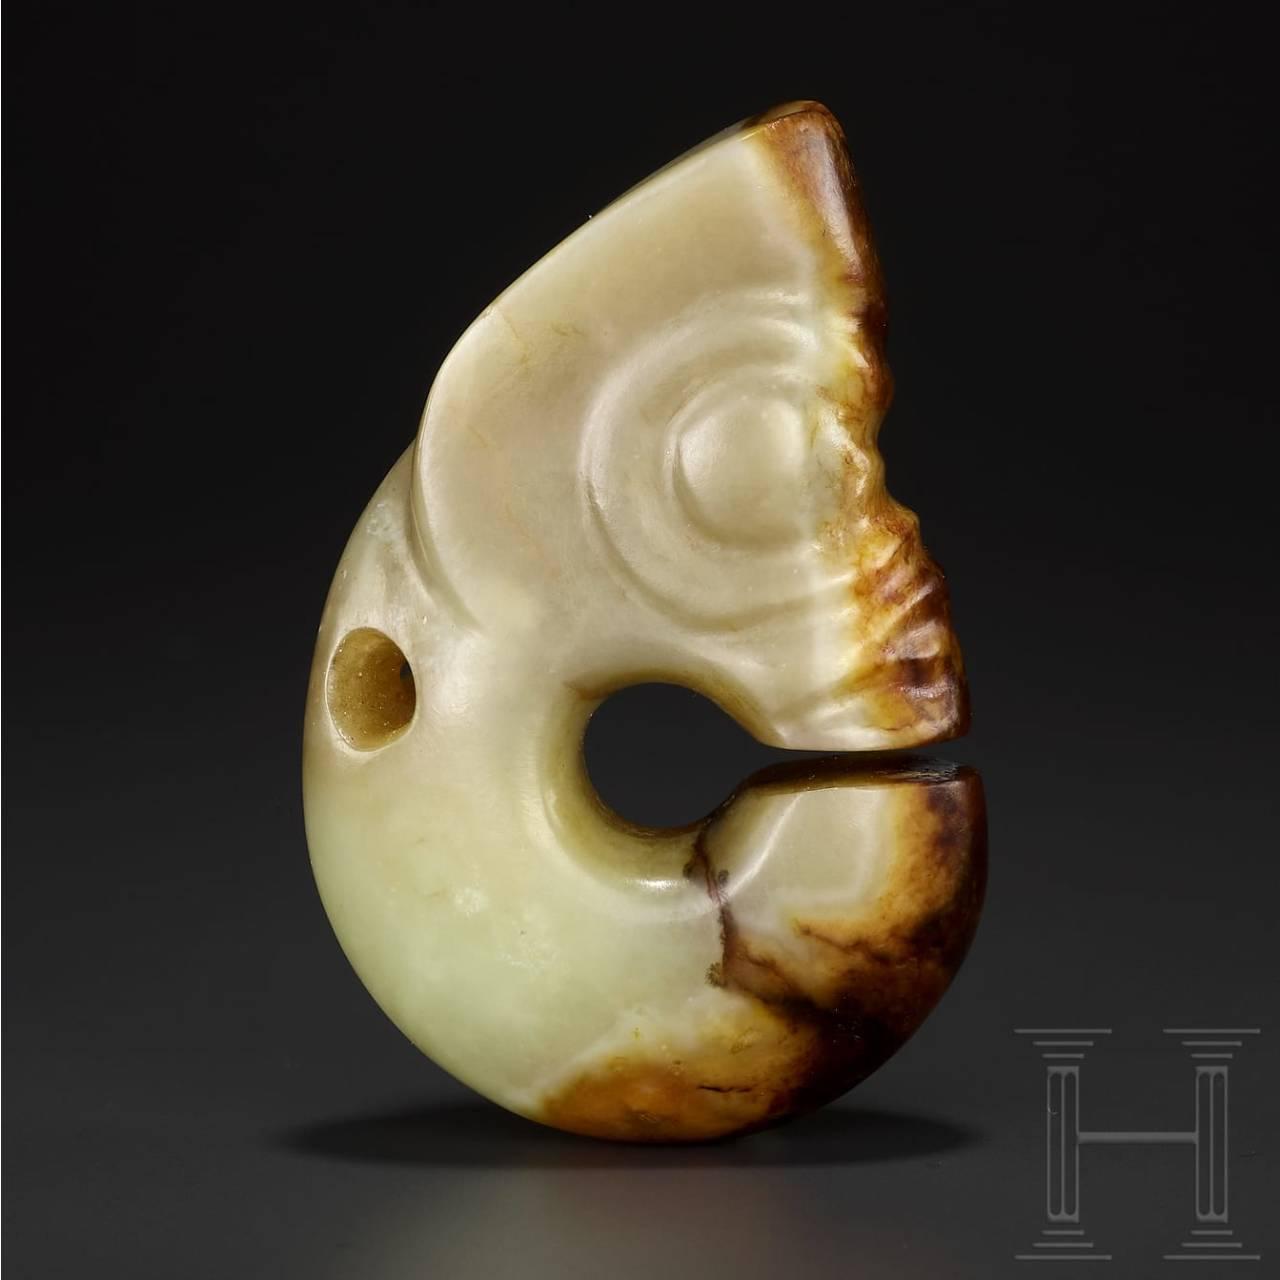 A Northeastern Chinese late Neolithic jade pig dragon (zhulong), Hongshan culture, 4700 - 2900 B.C.